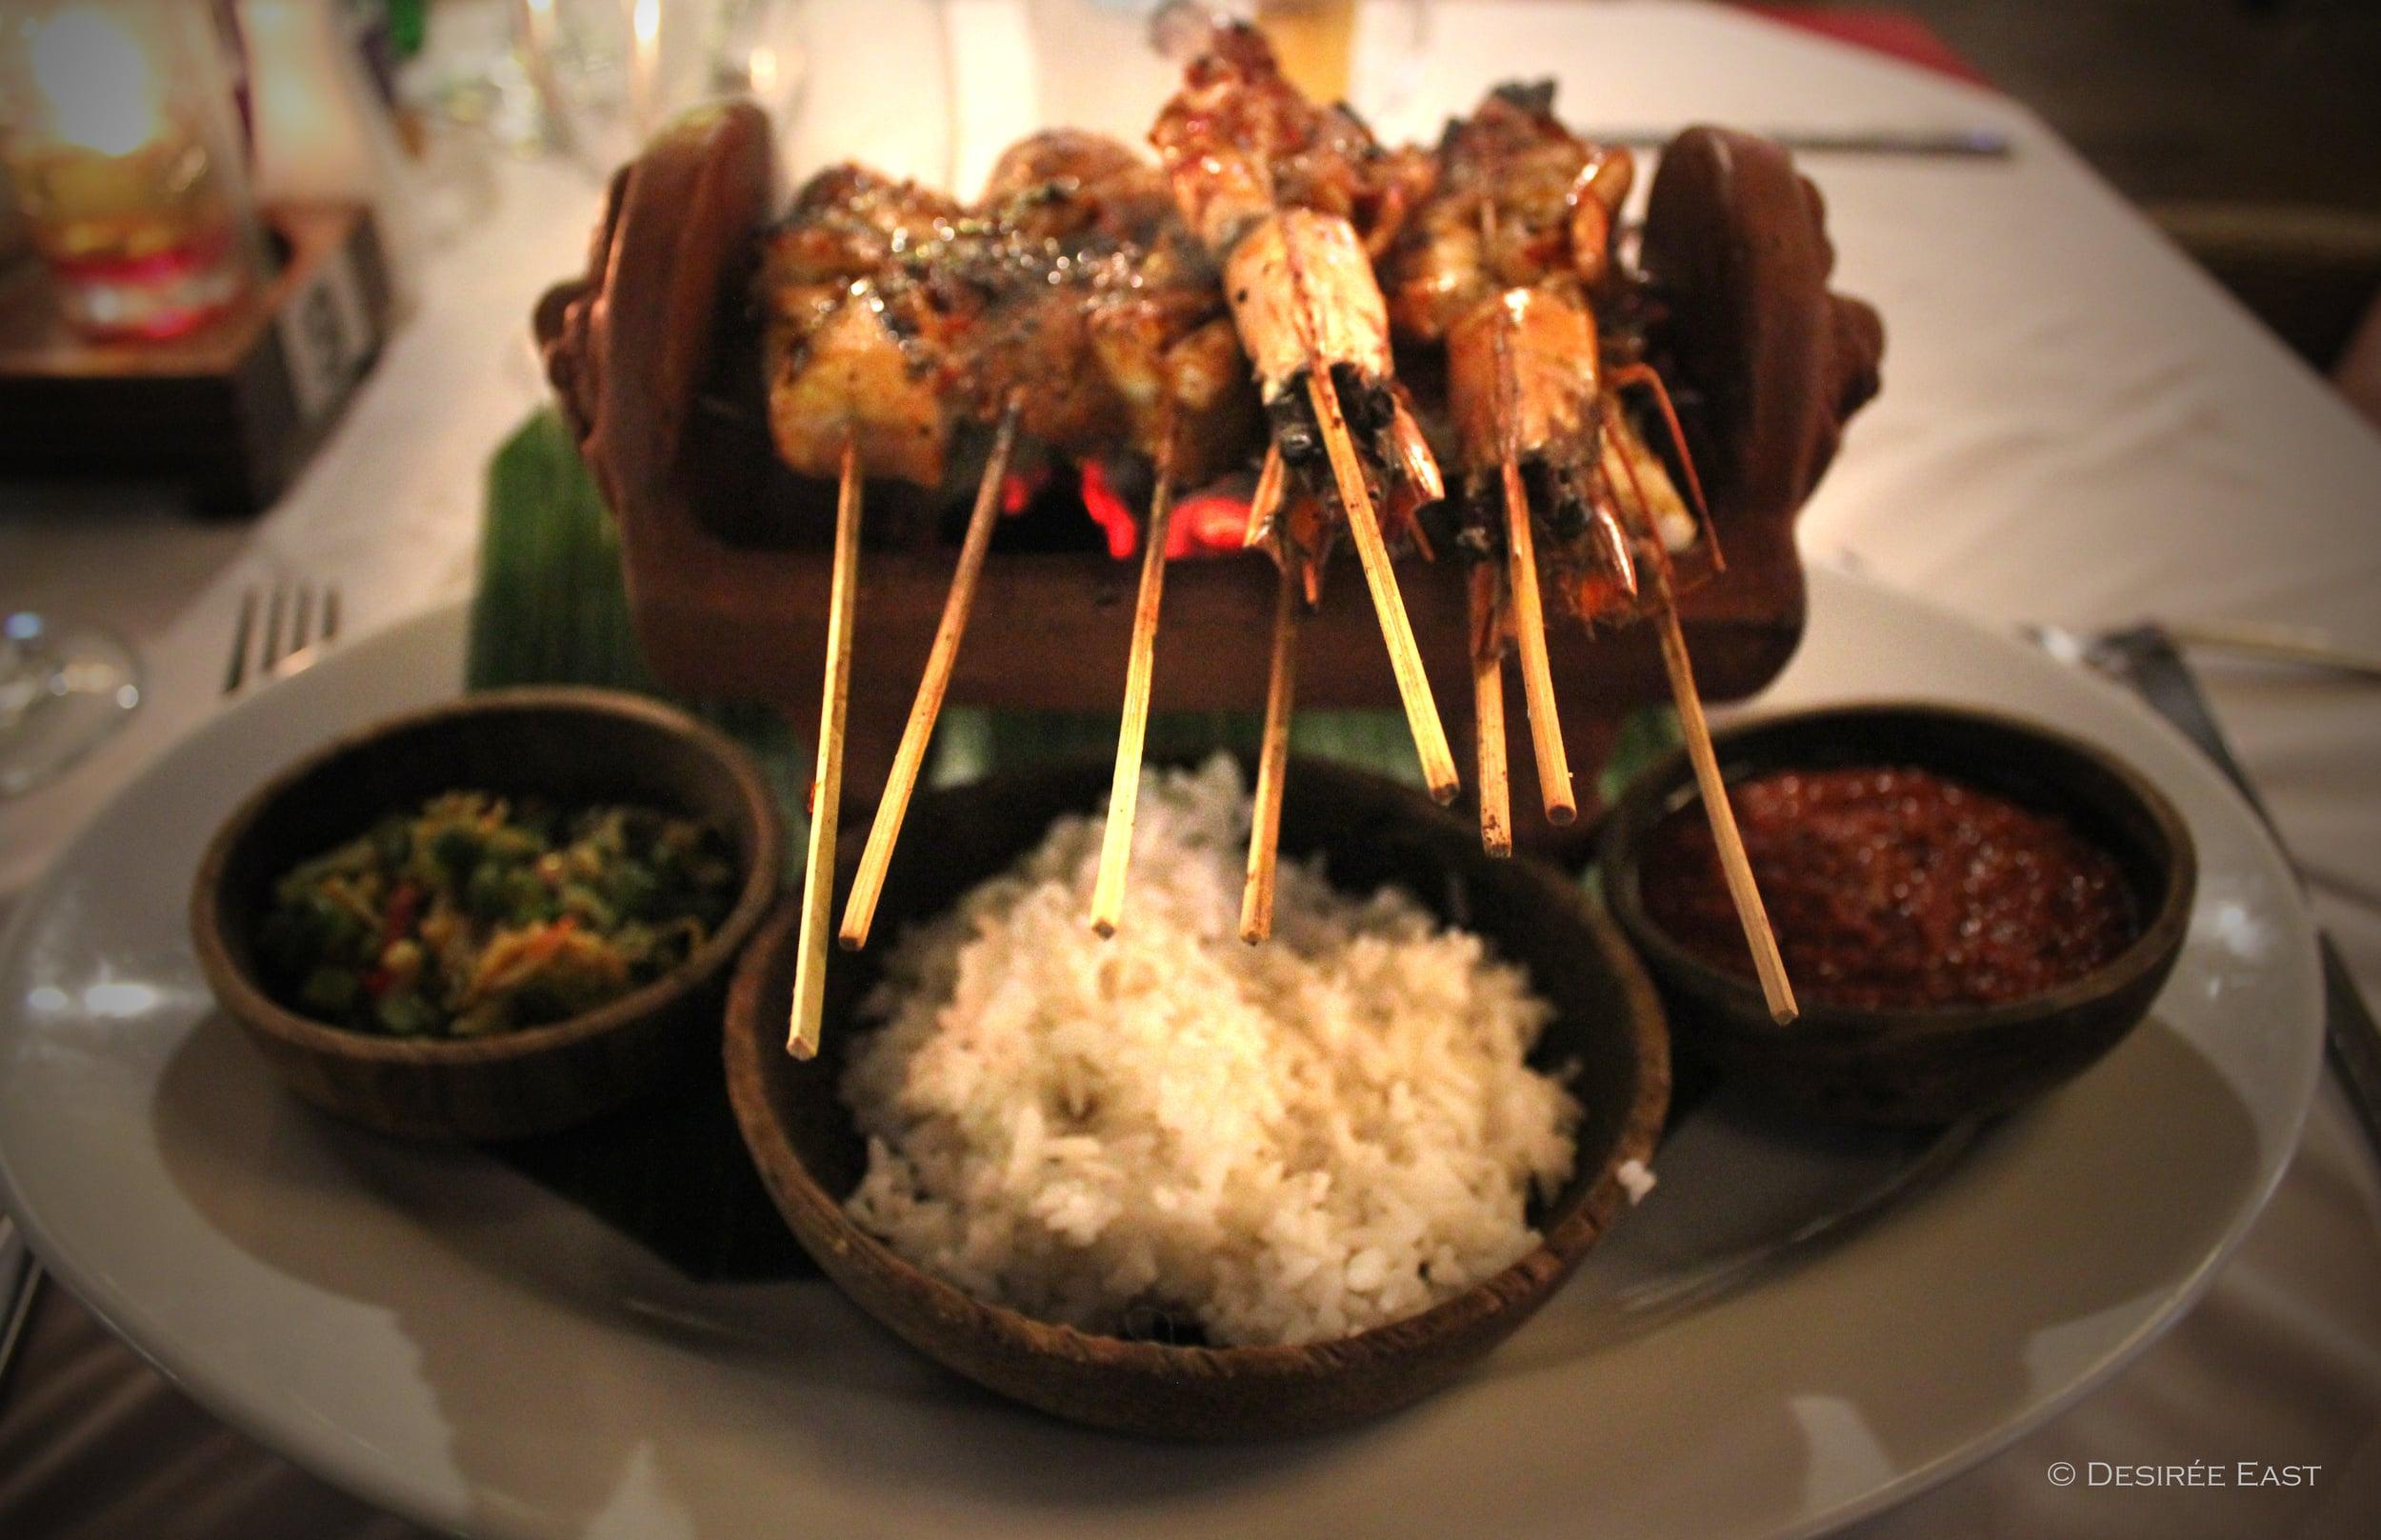 balinese seafood satay. bali, indonesia. photo by desiree east